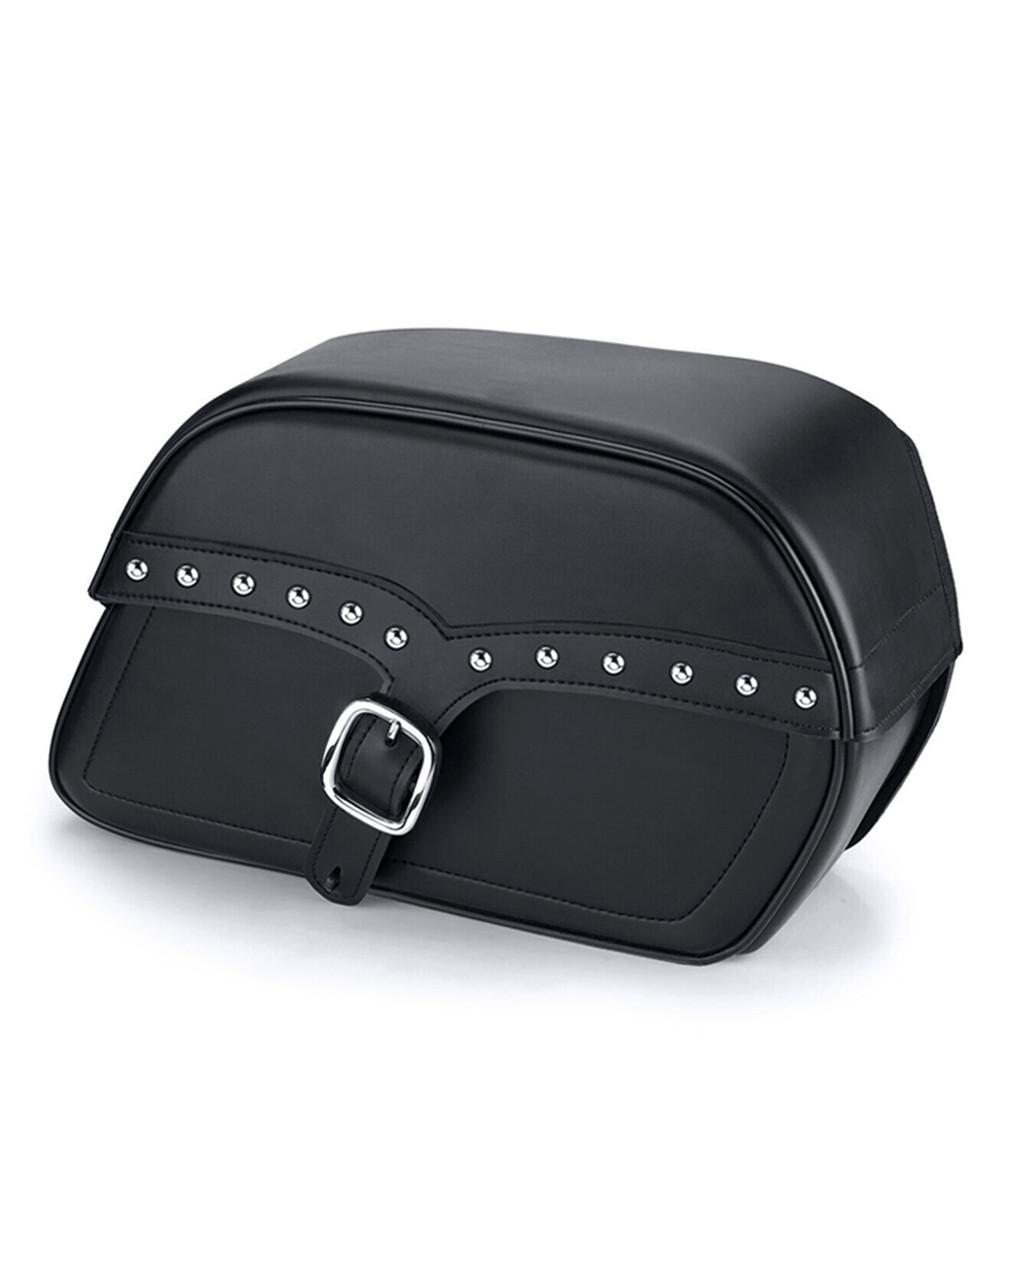 Honda 1500 Valkyrie Standard Uni SS Slanted Studded L Motorcycle saddlebags Main Bag View